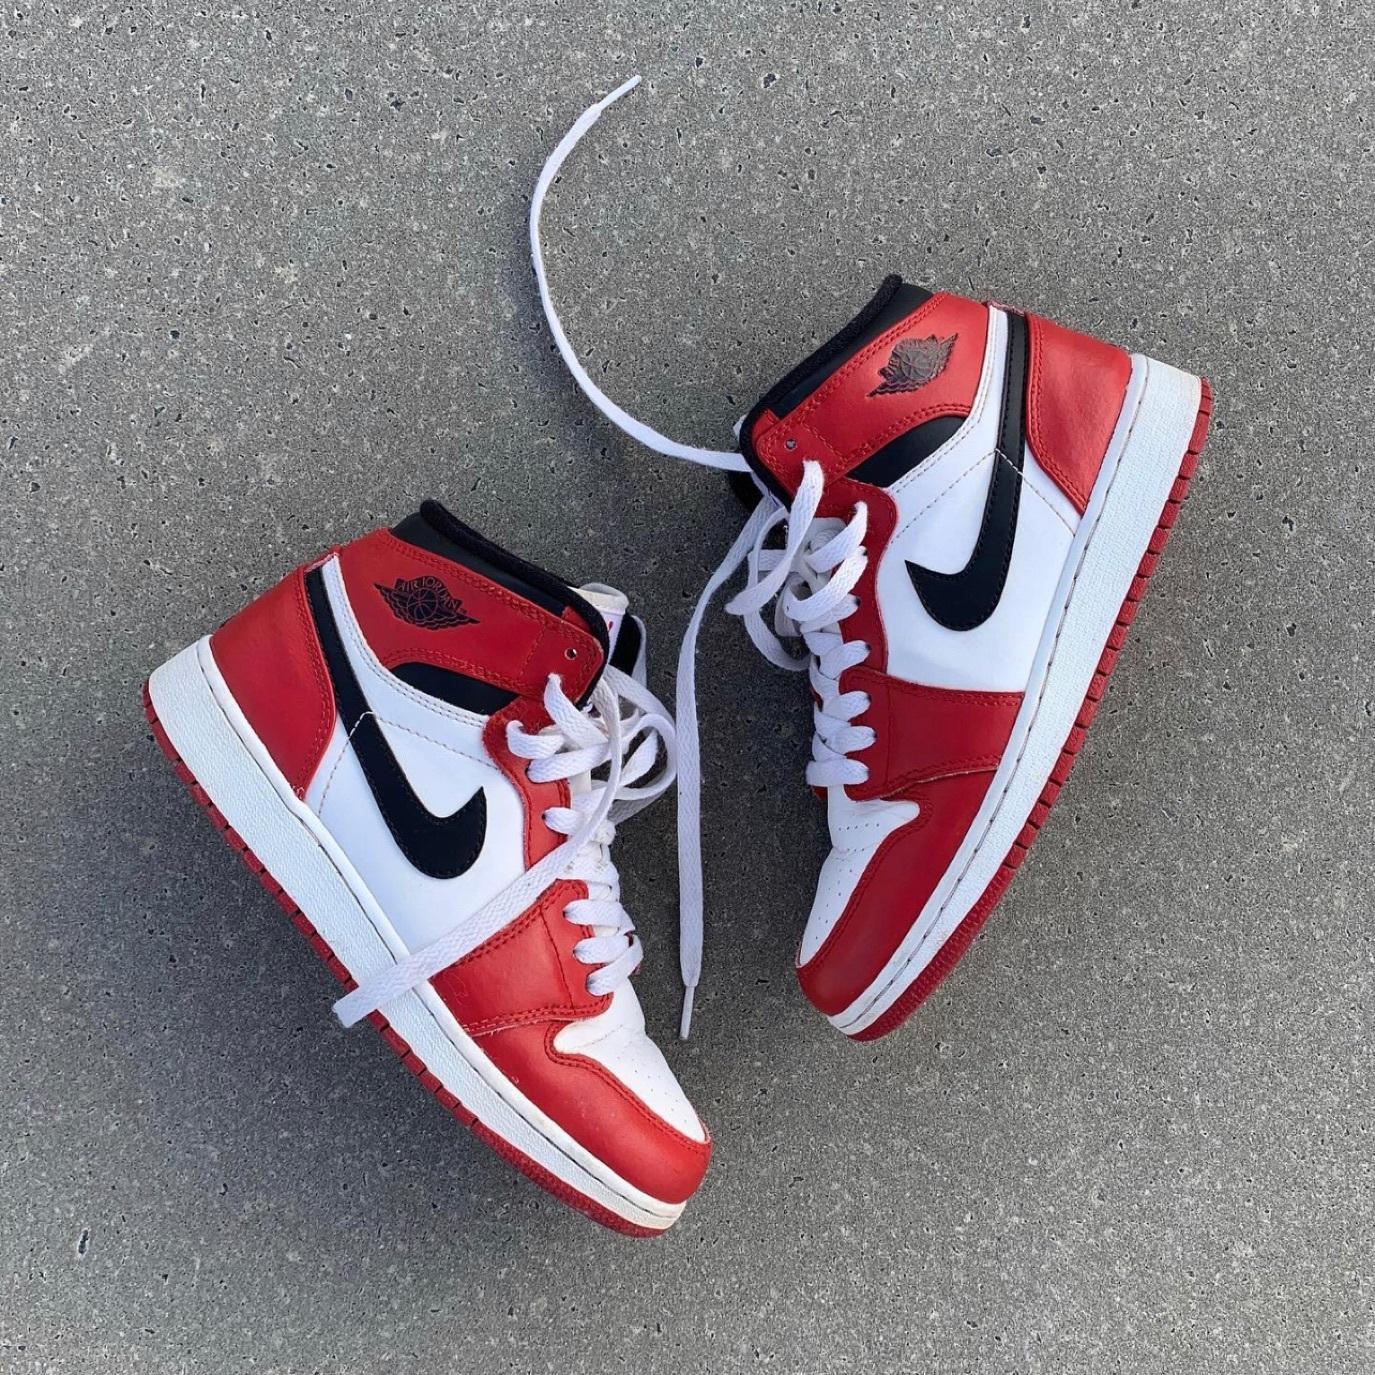 Nike Air Jordan 1 Retro White/Red